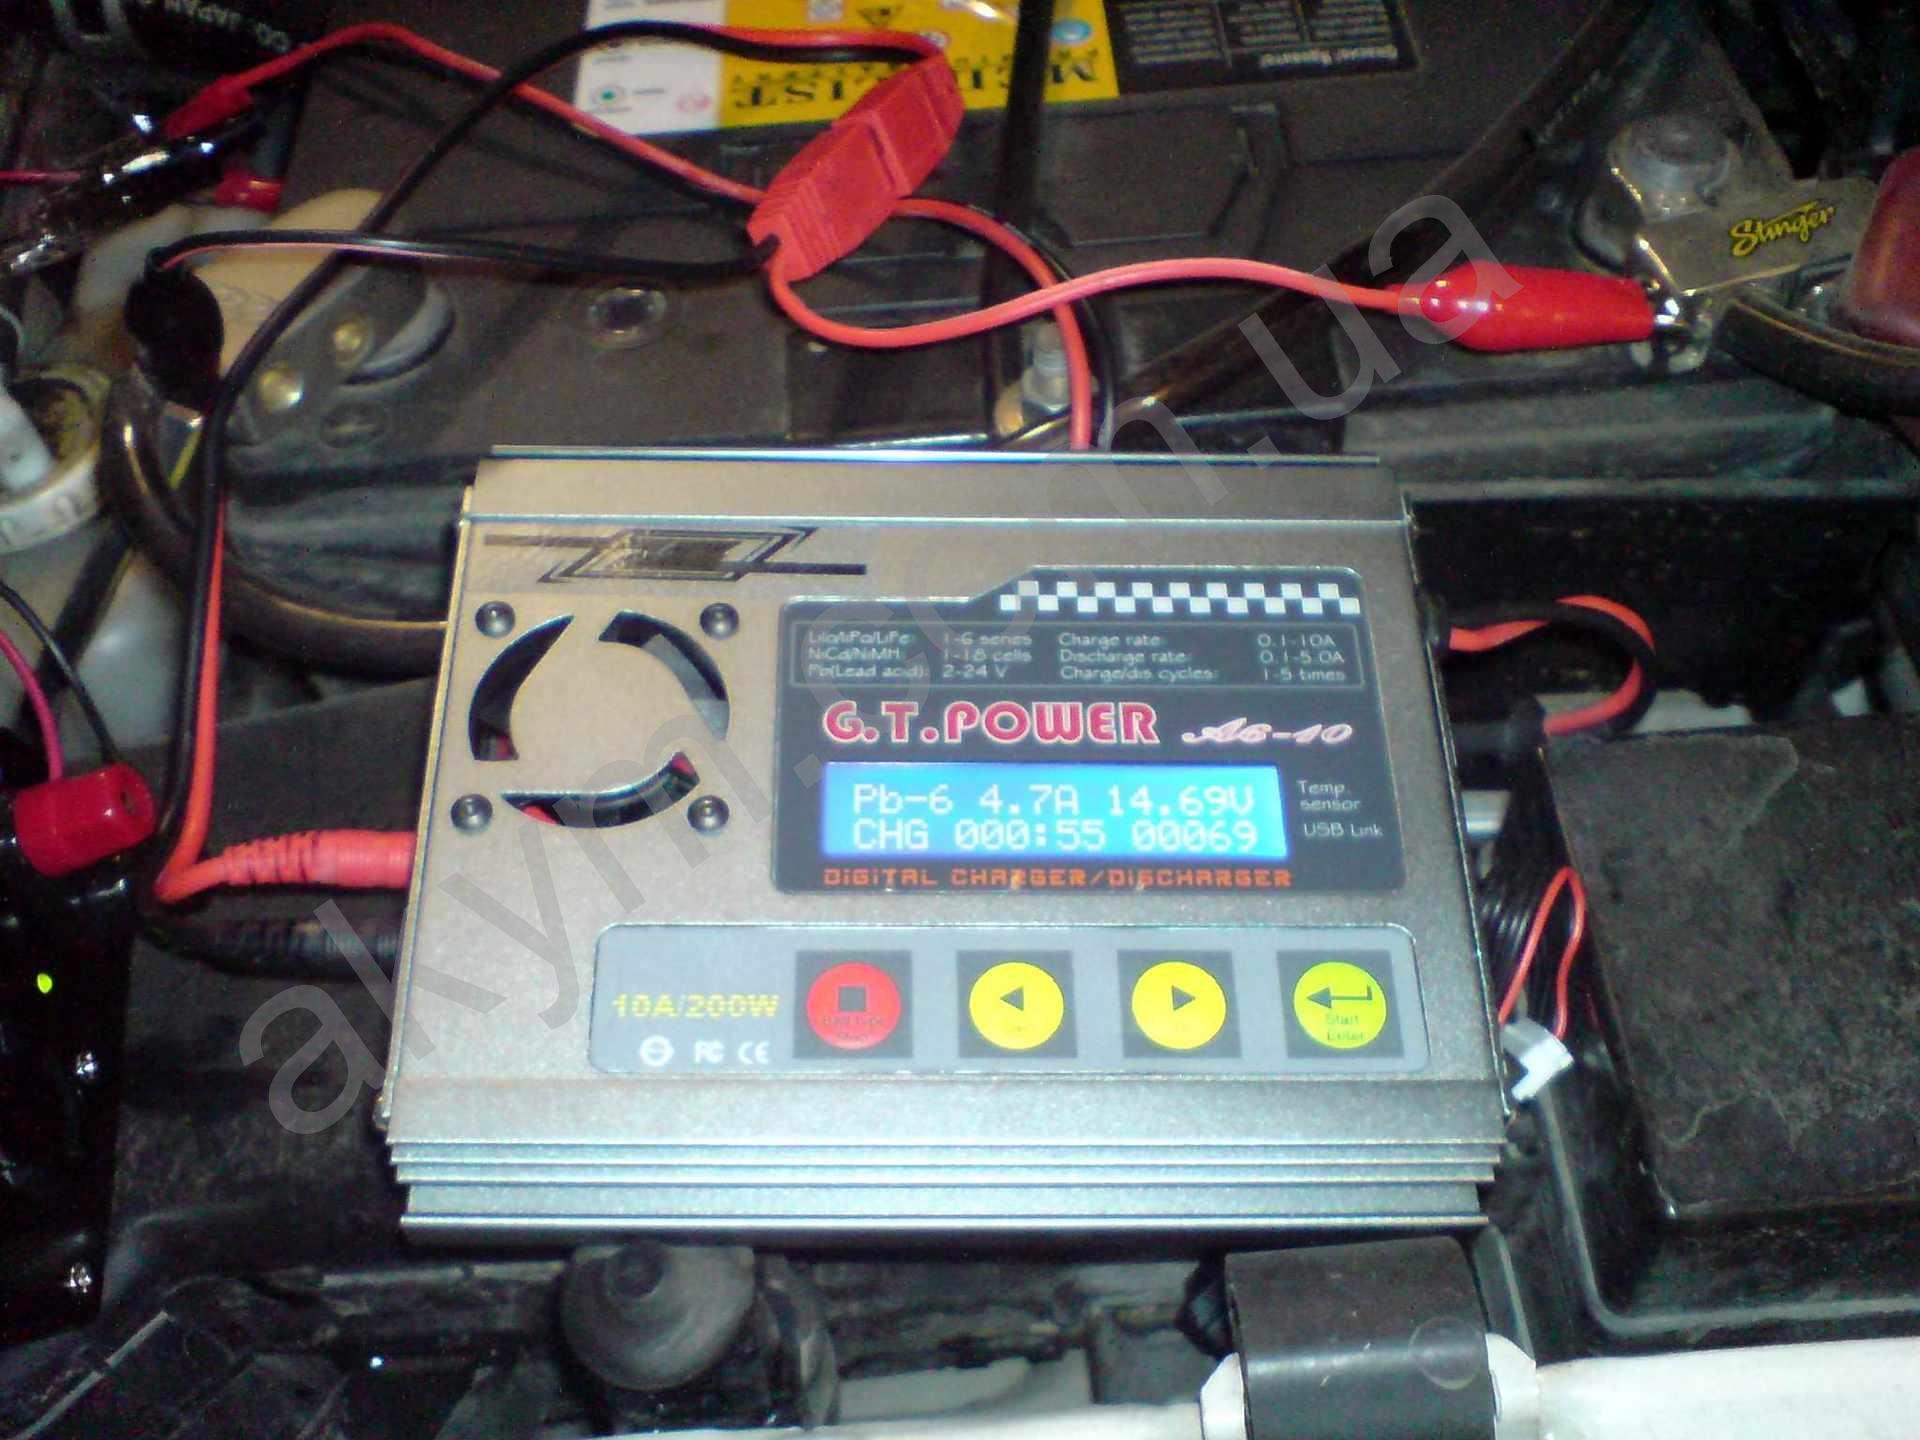 "ЗУ-24/12  ""ДУЭТ "". дну батарею 12В - током до 24А.  Зарядное устройство для 24V аккумулятора ( двух 12 V АКБ)"